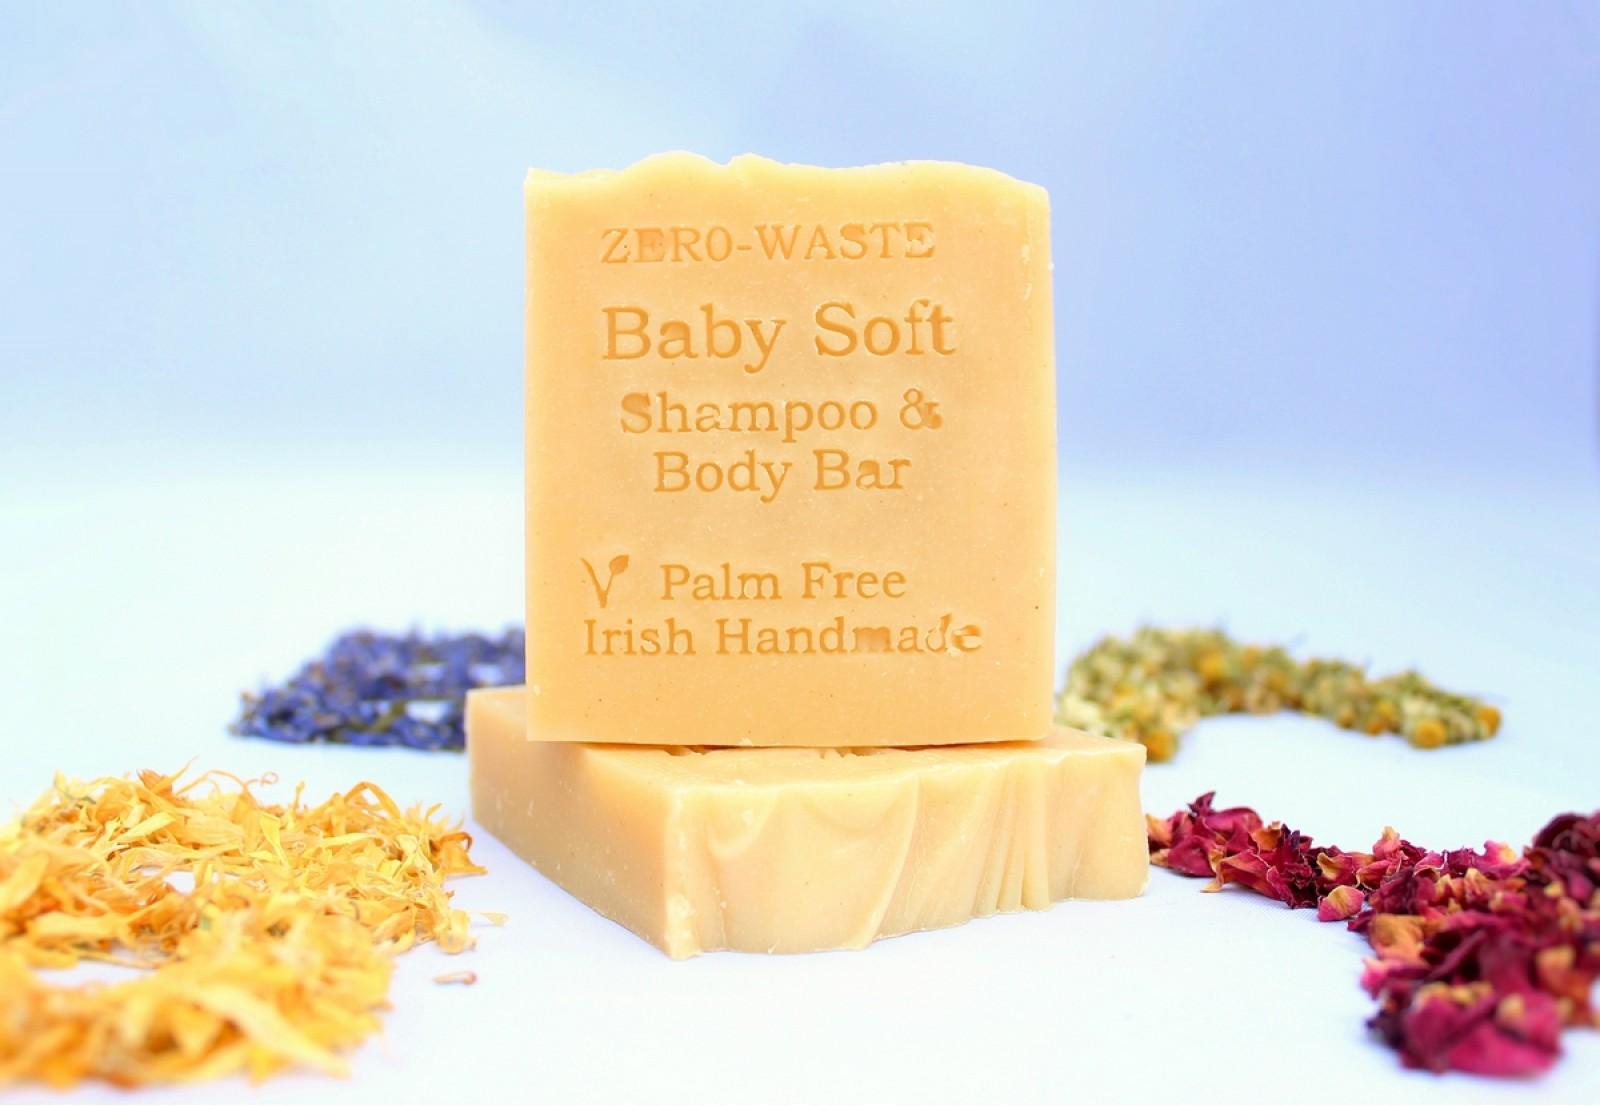 Baby Soft Shampoo & Body Bar Image